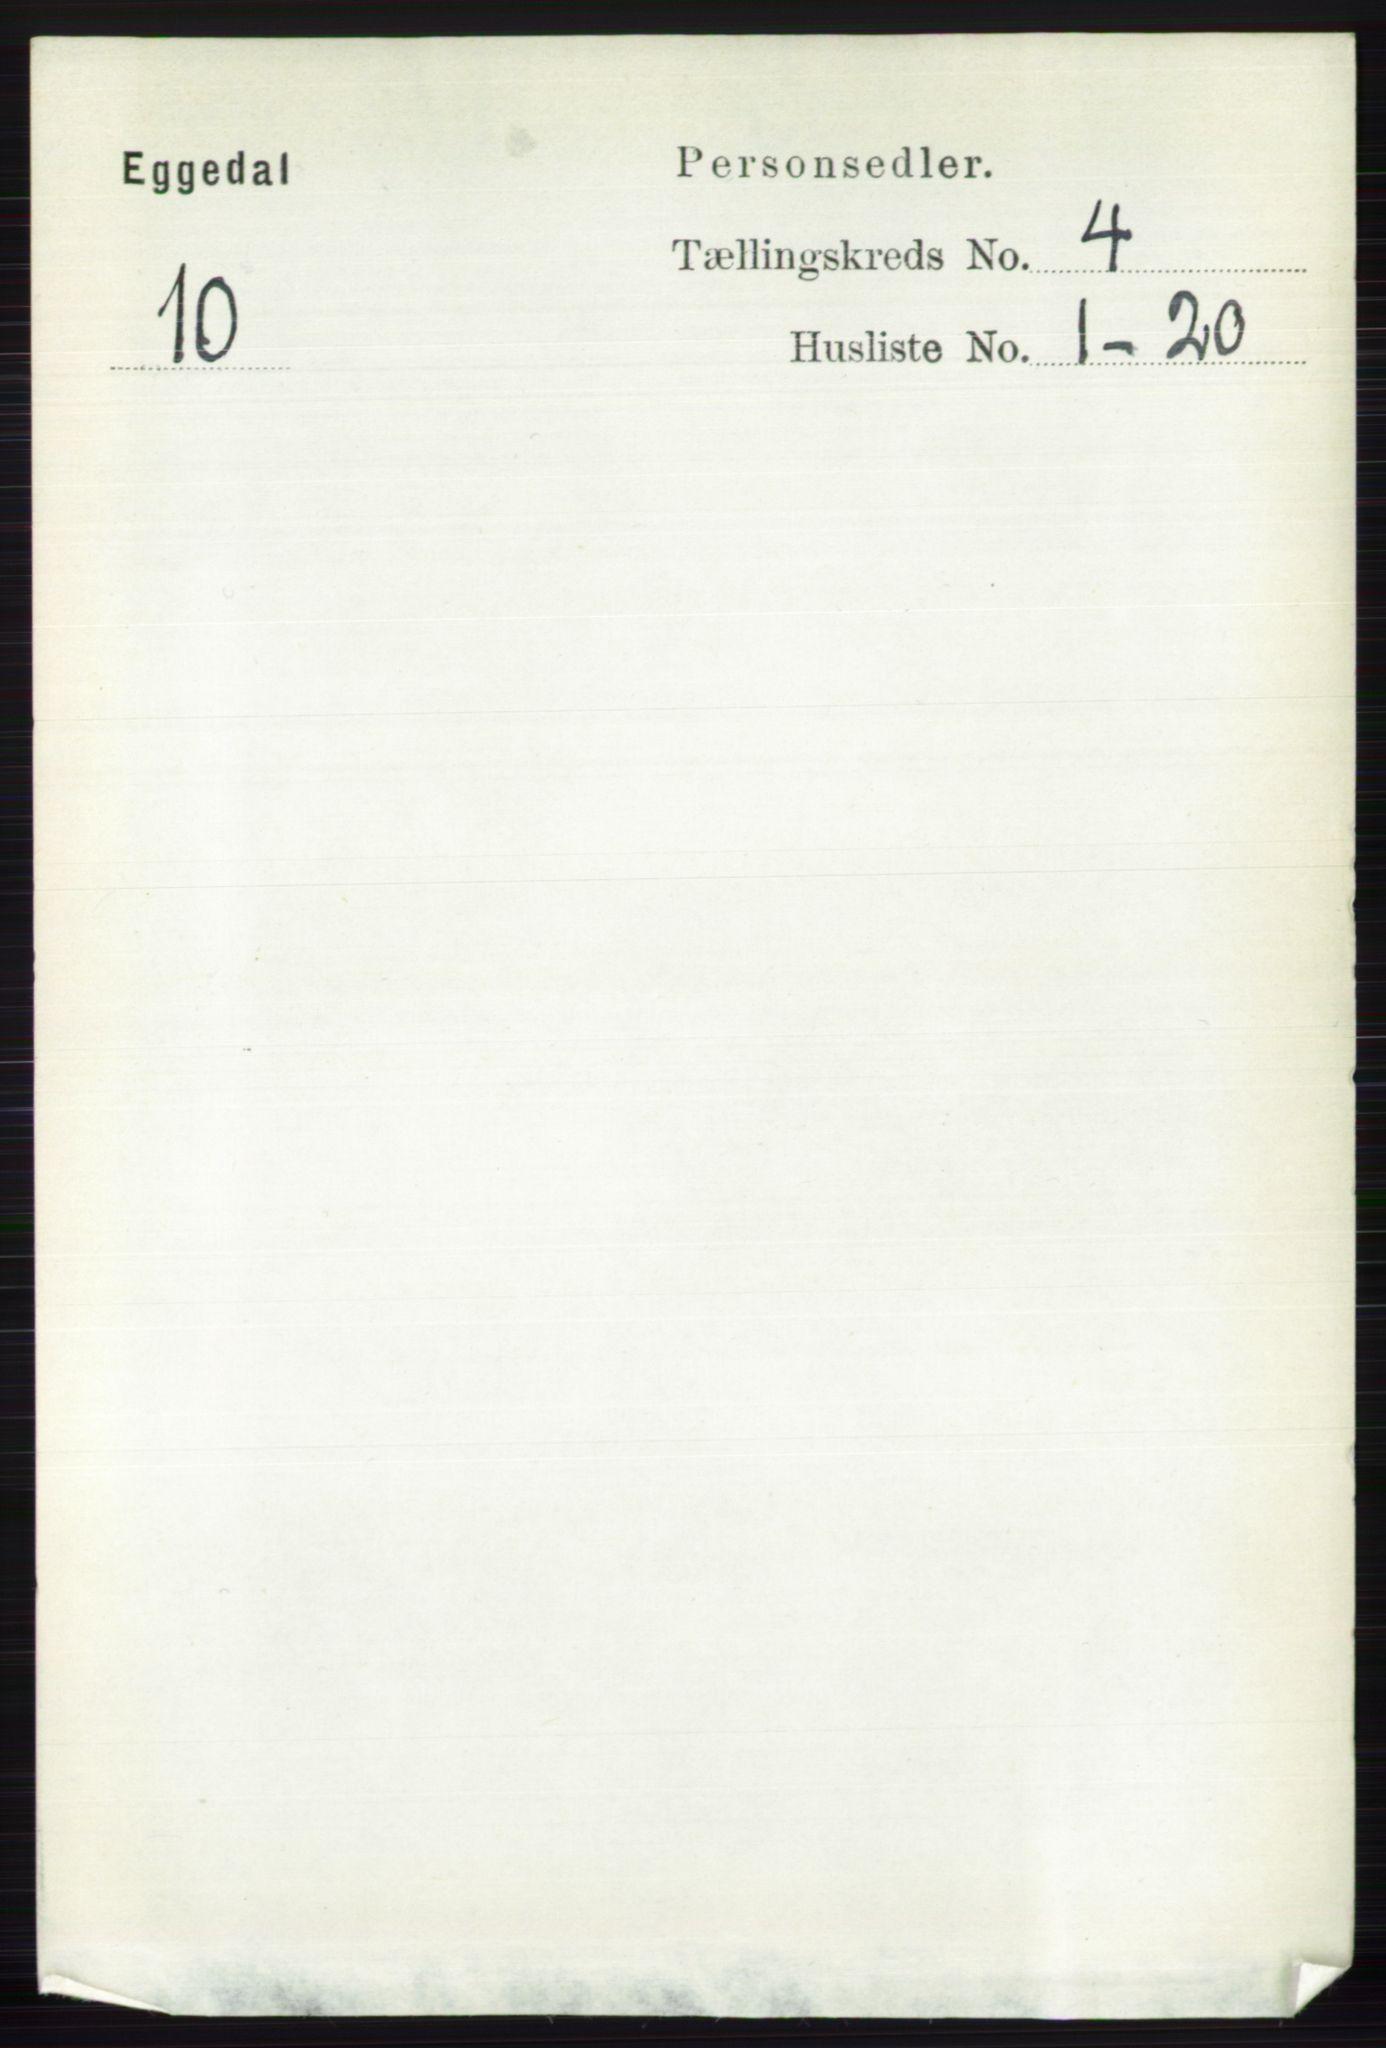 RA, Folketelling 1891 for 0621 Sigdal herred, 1891, s. 4667